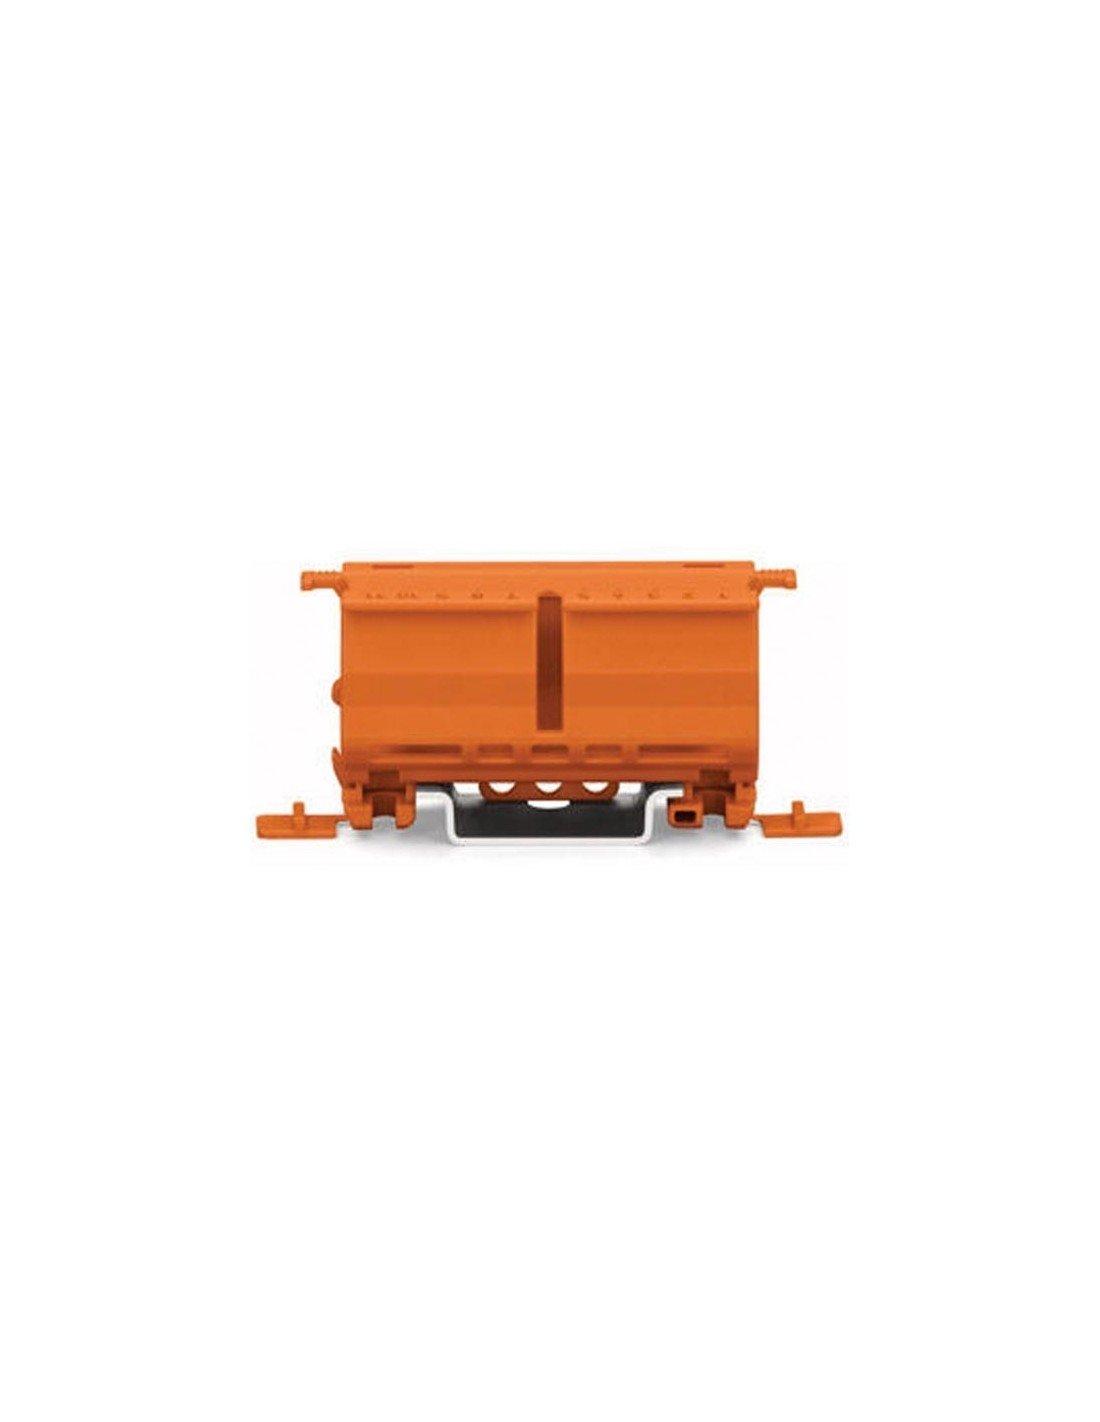 Serie 22 orange 221-500     10 Stück WAGO 221-500 Befestigungsadapter f